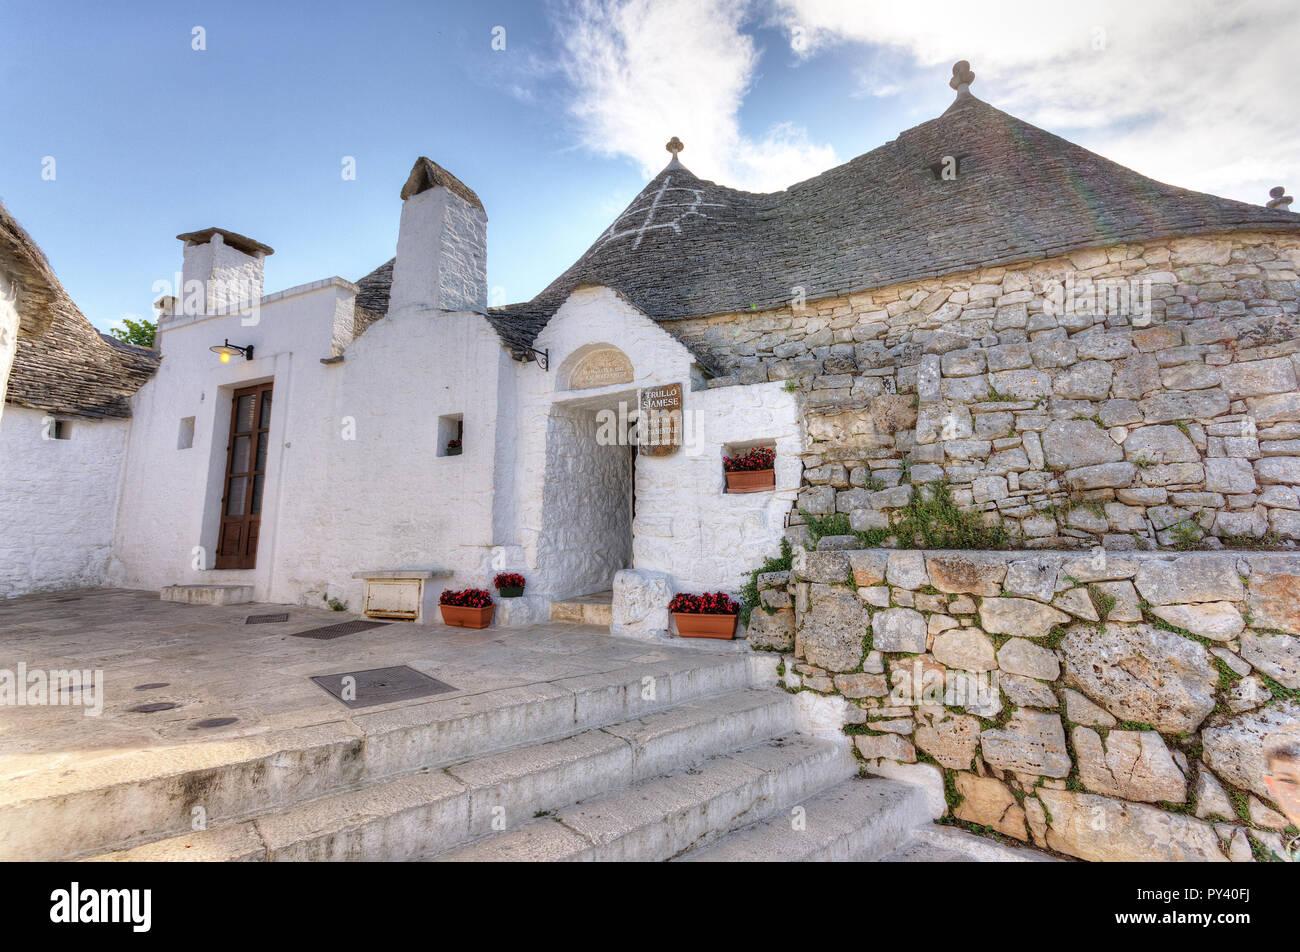 Italia. La Apulia. Alberobello, Trulli, casas típicas, Trullo Siamés Imagen De Stock